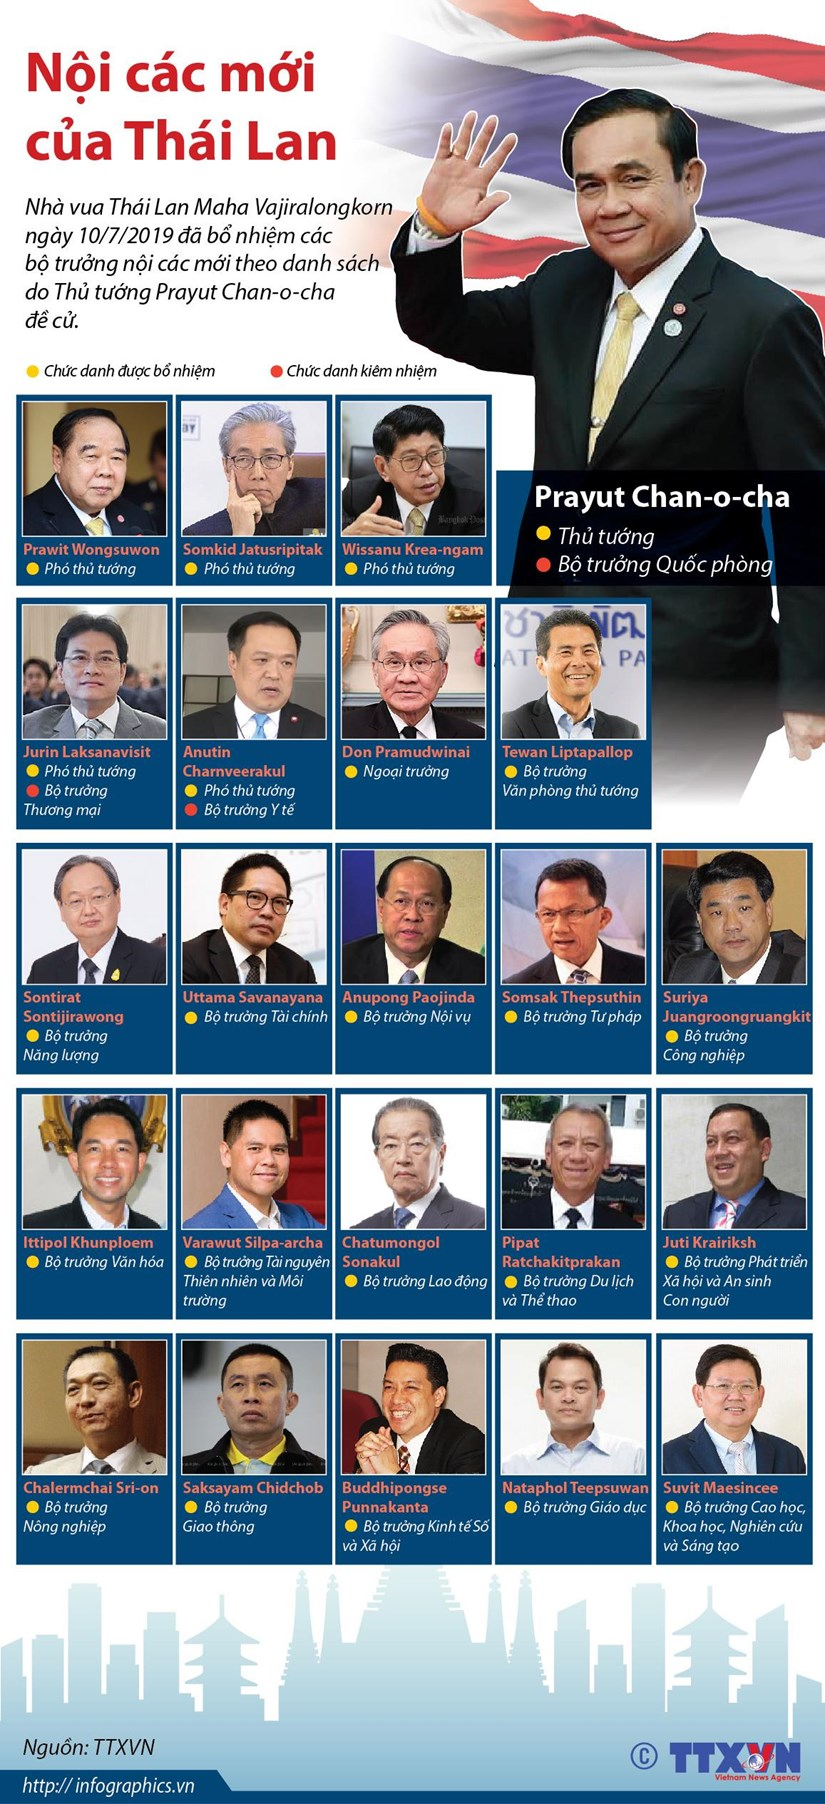 [Infographics] Danh sach cac thanh vien Noi cac moi cua Thai Lan hinh anh 1